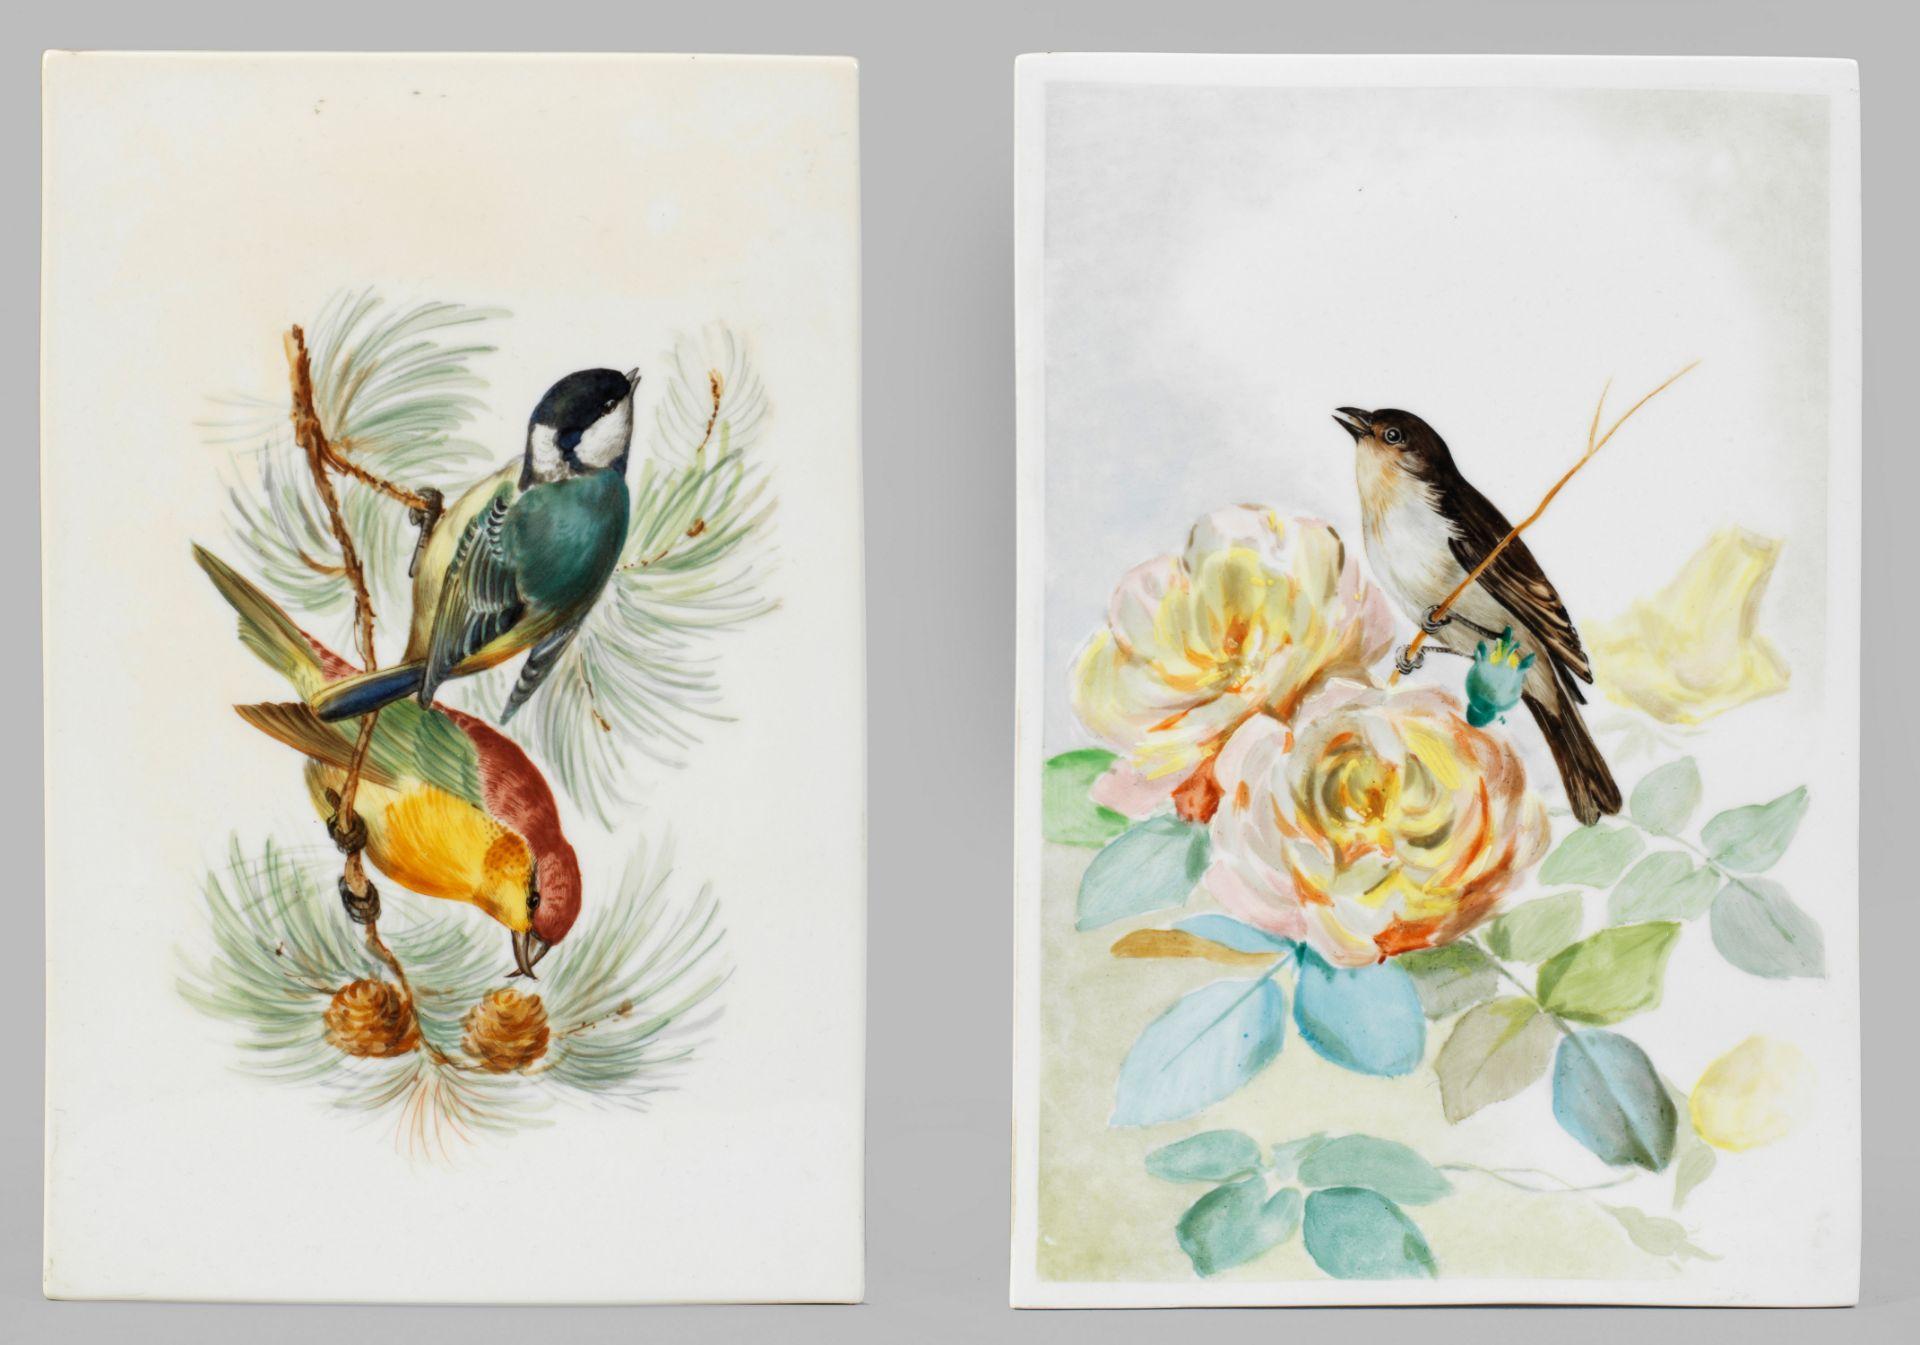 Paar Bildplatten mit Vogelmotiven